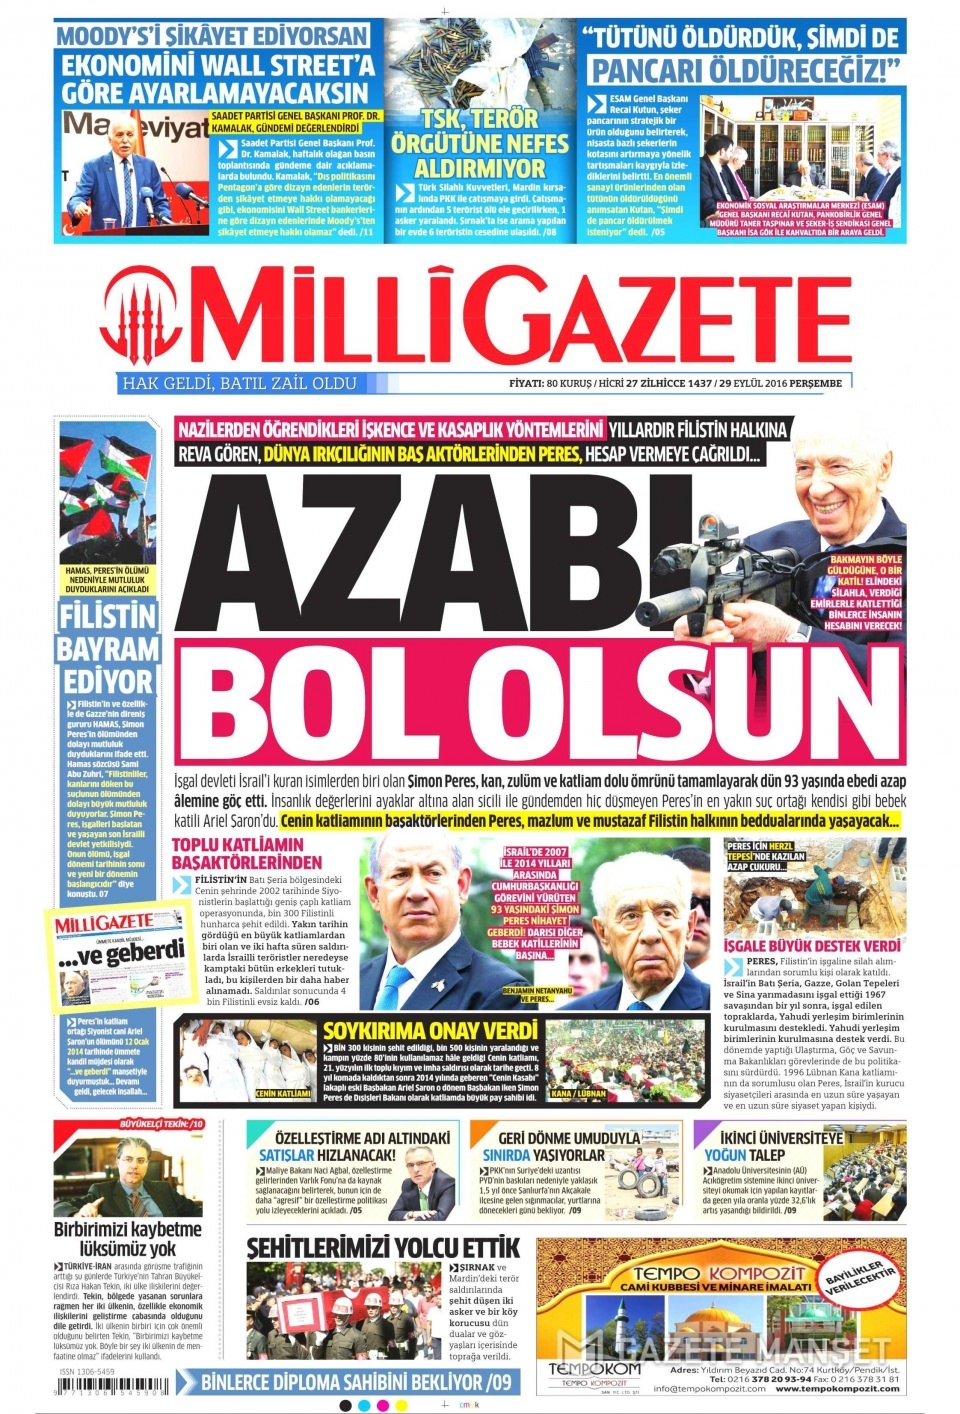 29 Eylül Perşembe gazete manşetleri 13